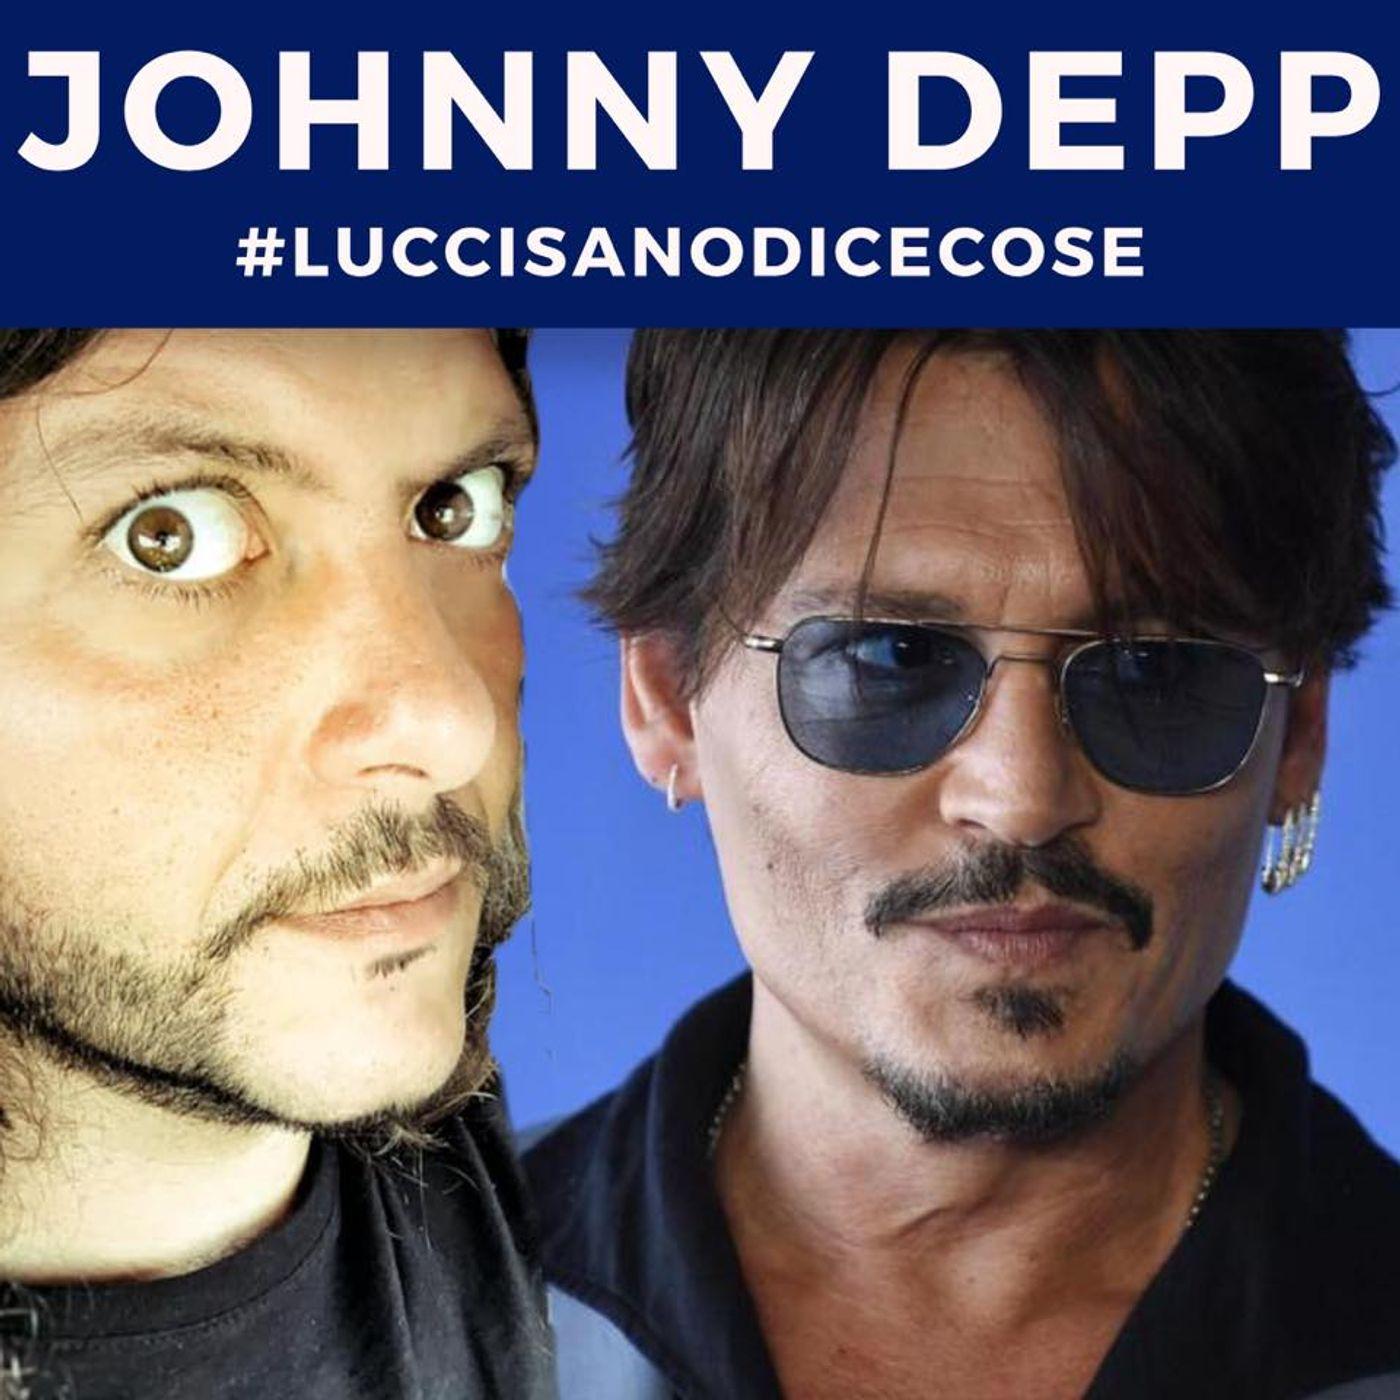 Johnny Depp by Emiliano Luccisano